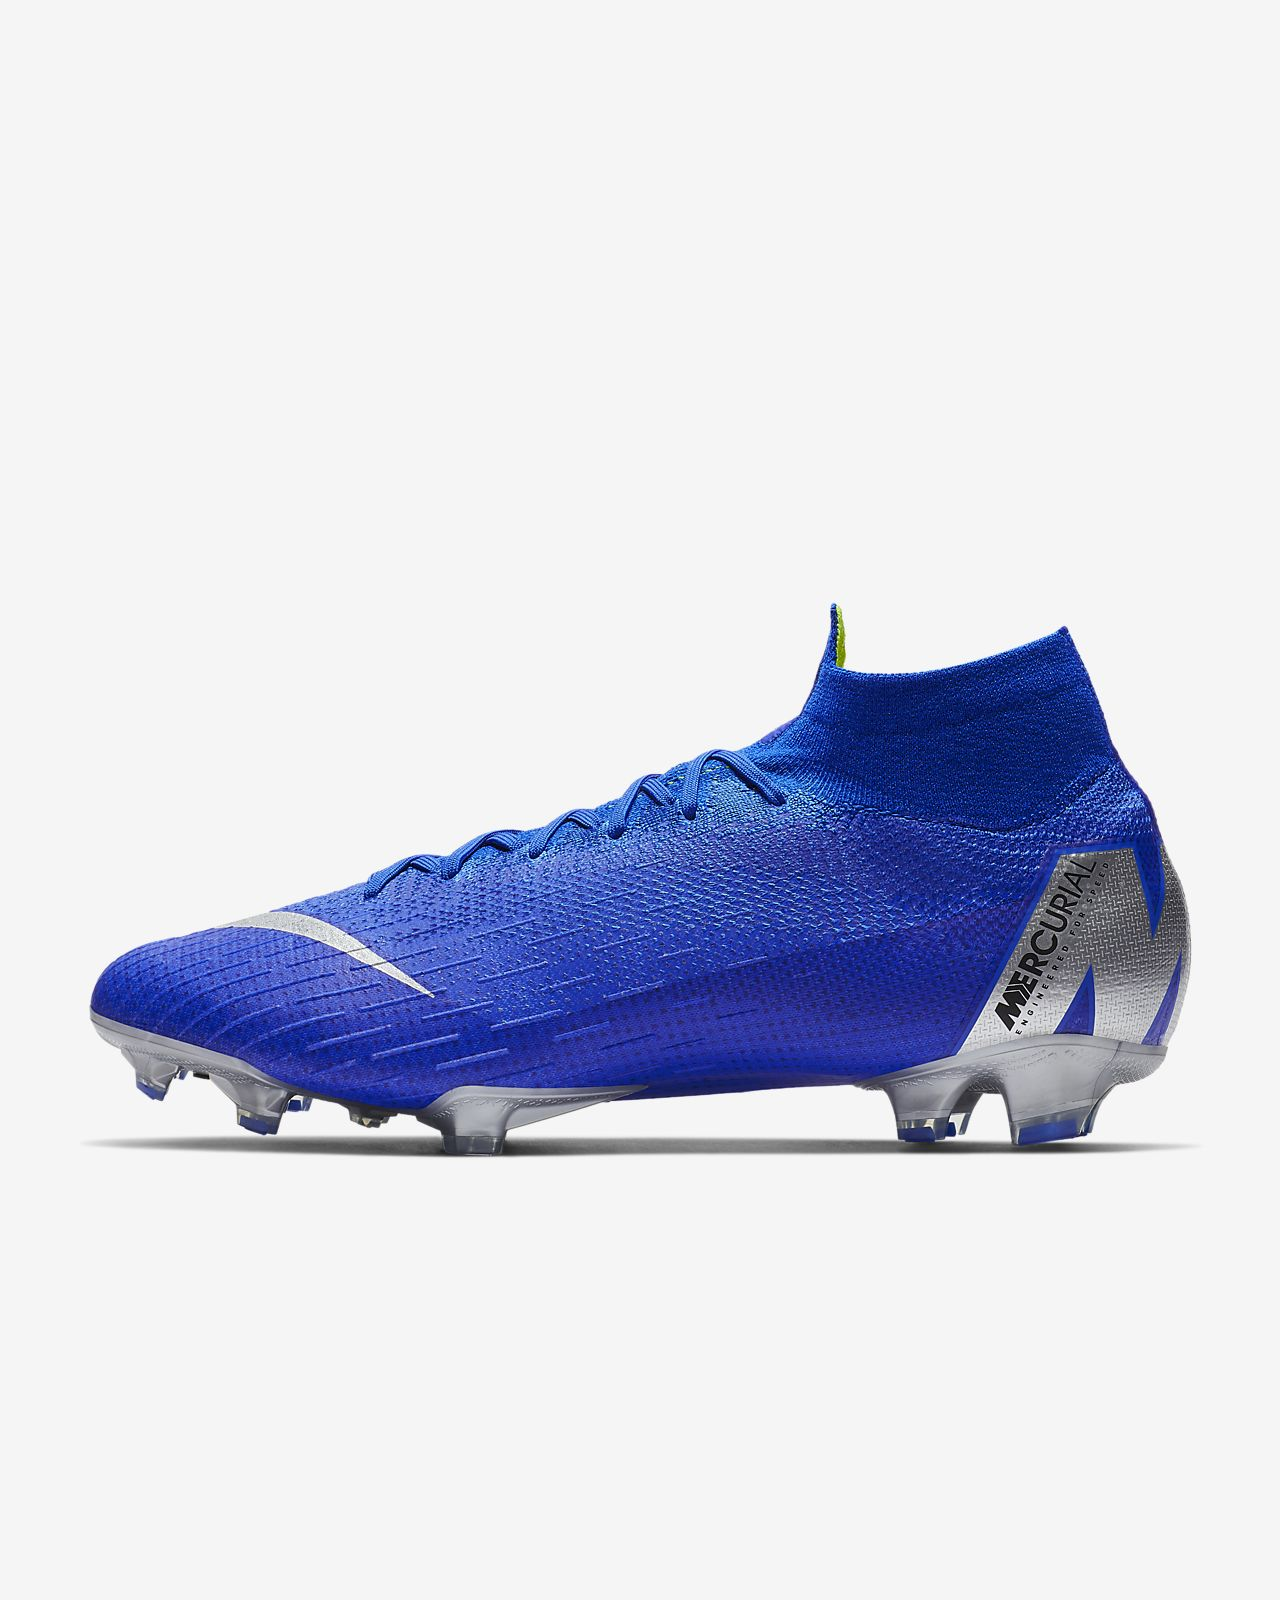 91528b26a0 Chaussure de football  rampons pour terrain sec Nike Superfly 6 ...